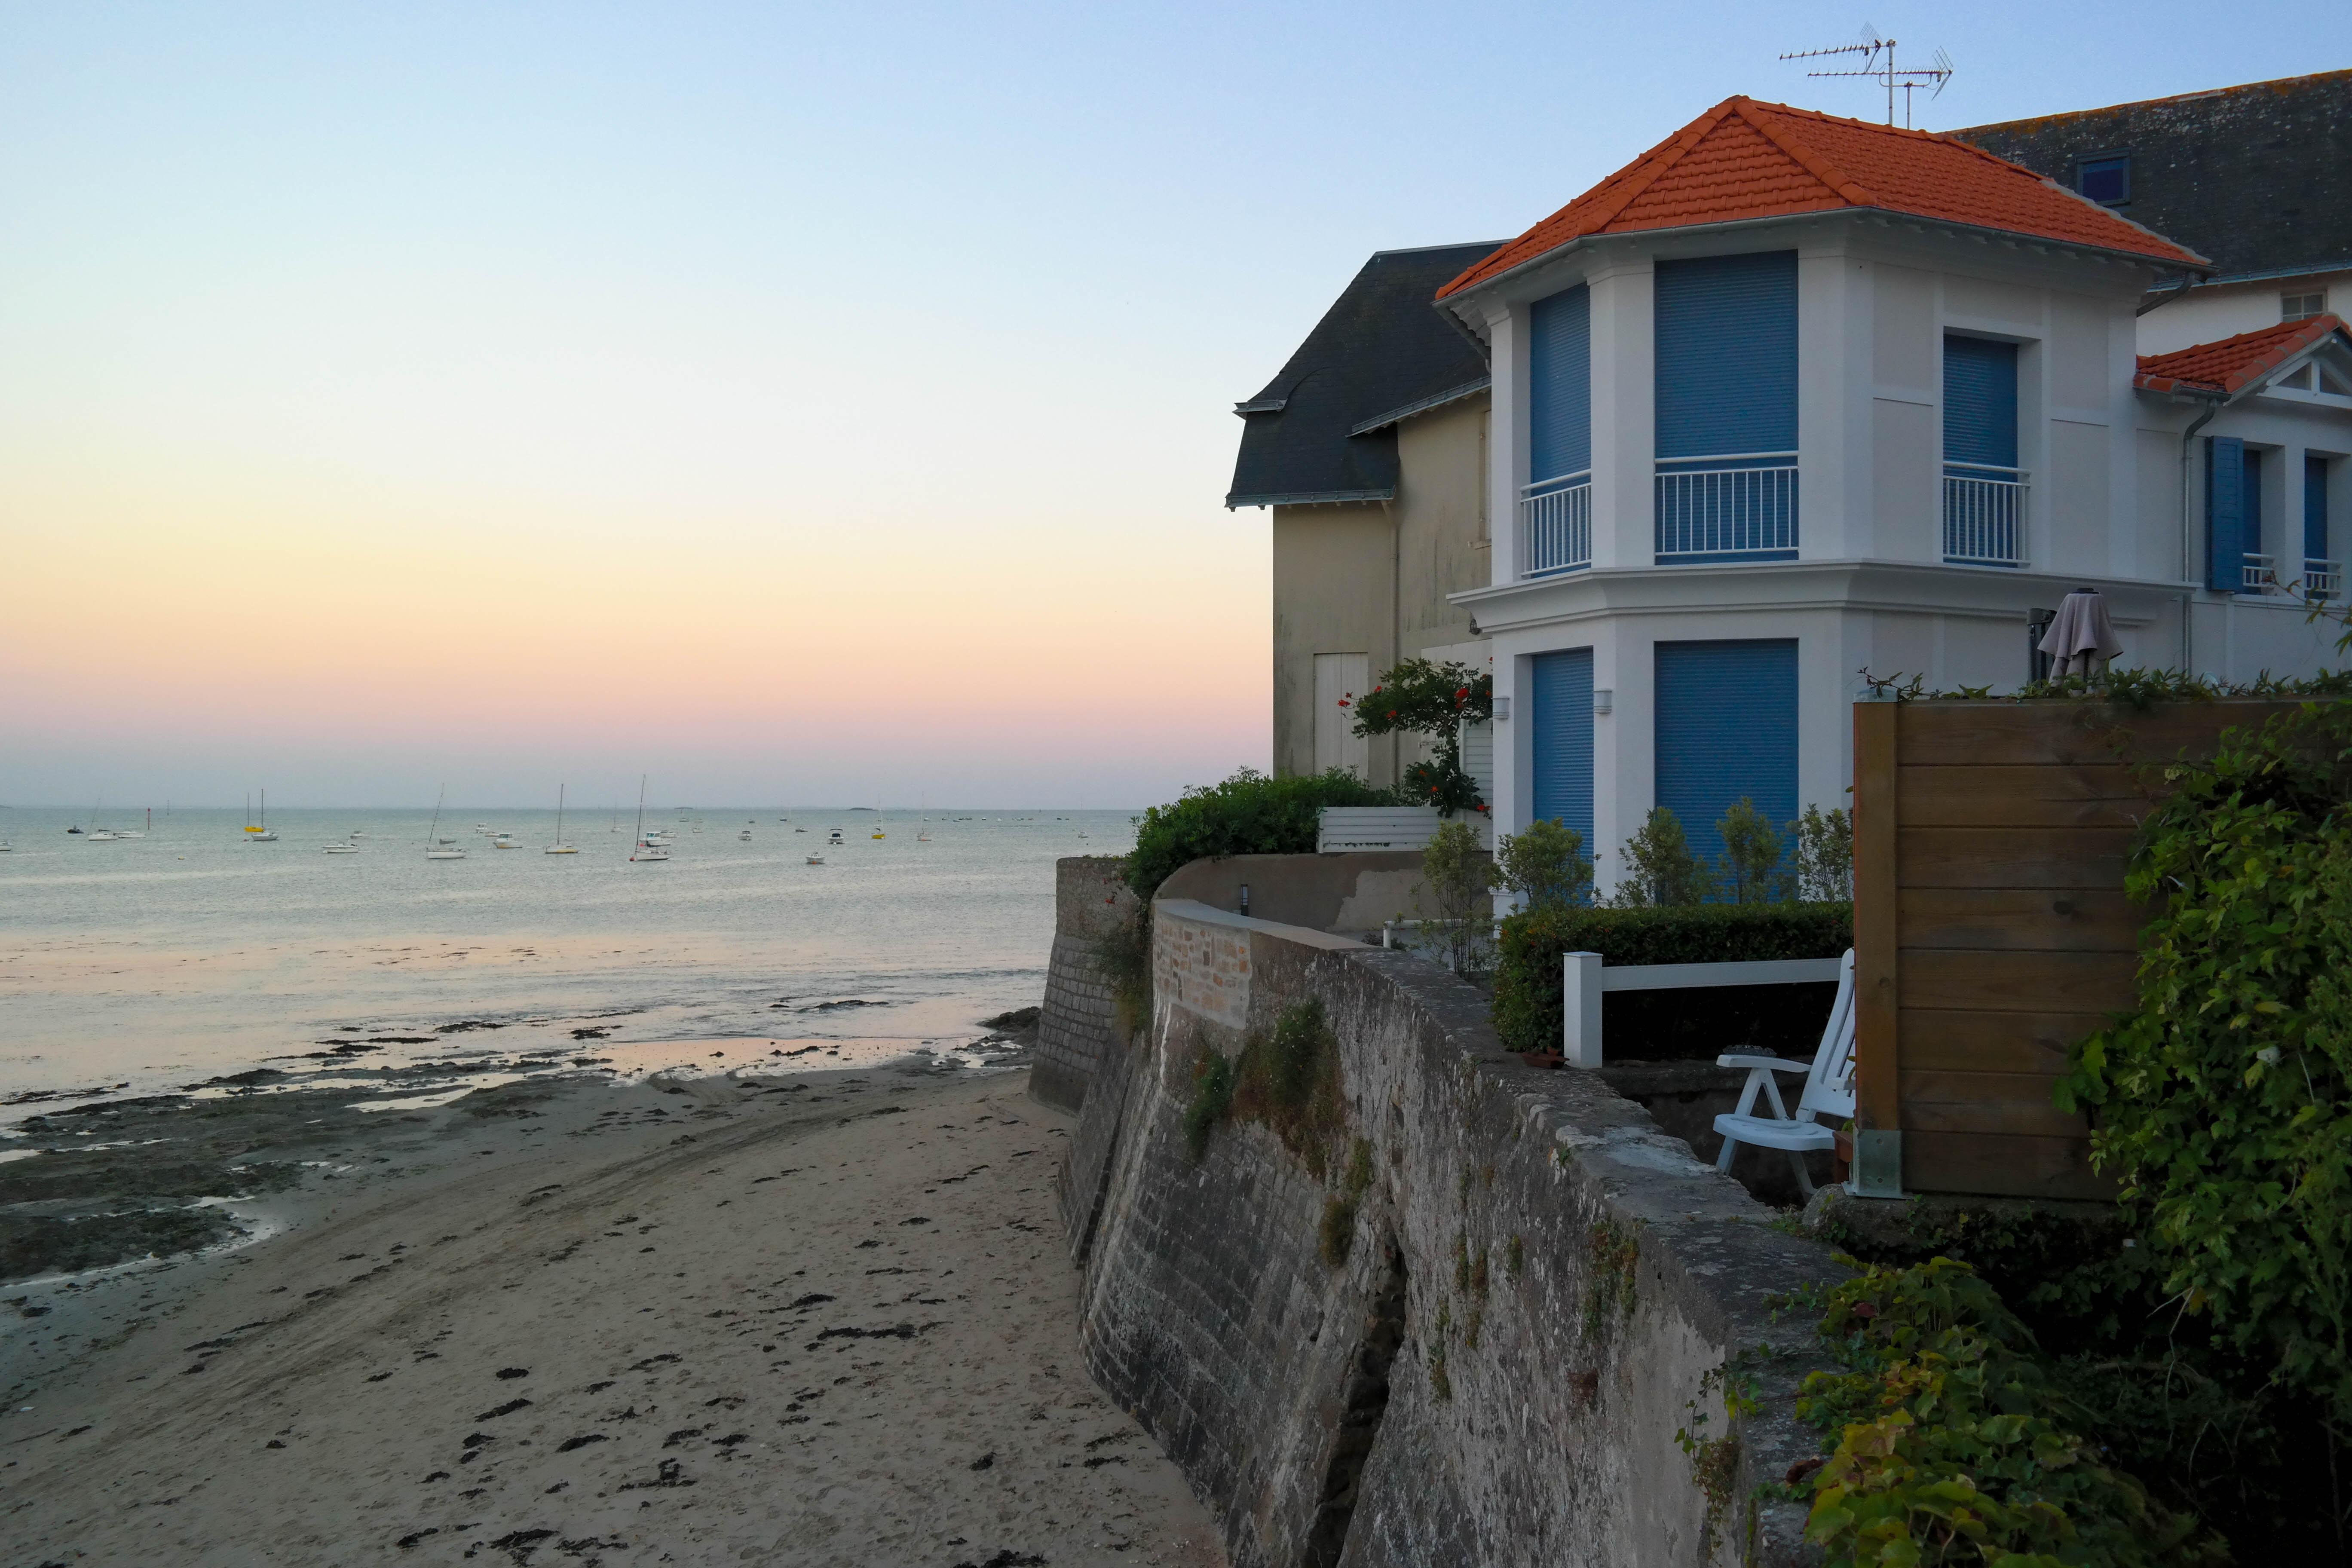 Le Poligen, France